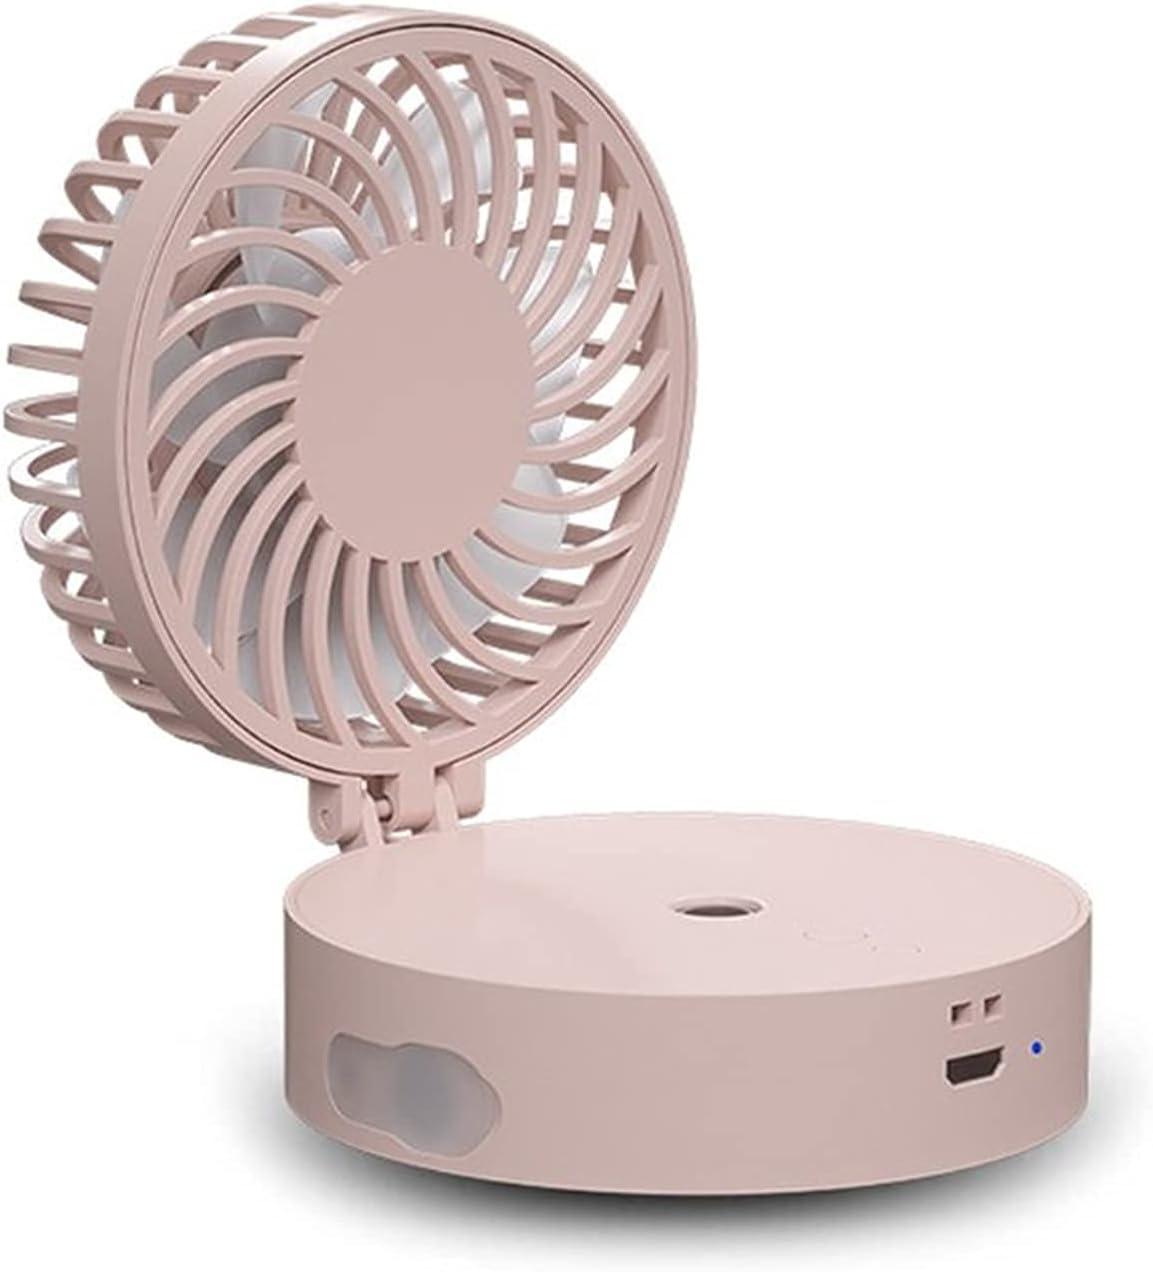 Max 62% OFF Bombing free shipping ZJSXIA Portable Summer Mini Handheld Water Folding Fan Mist USB